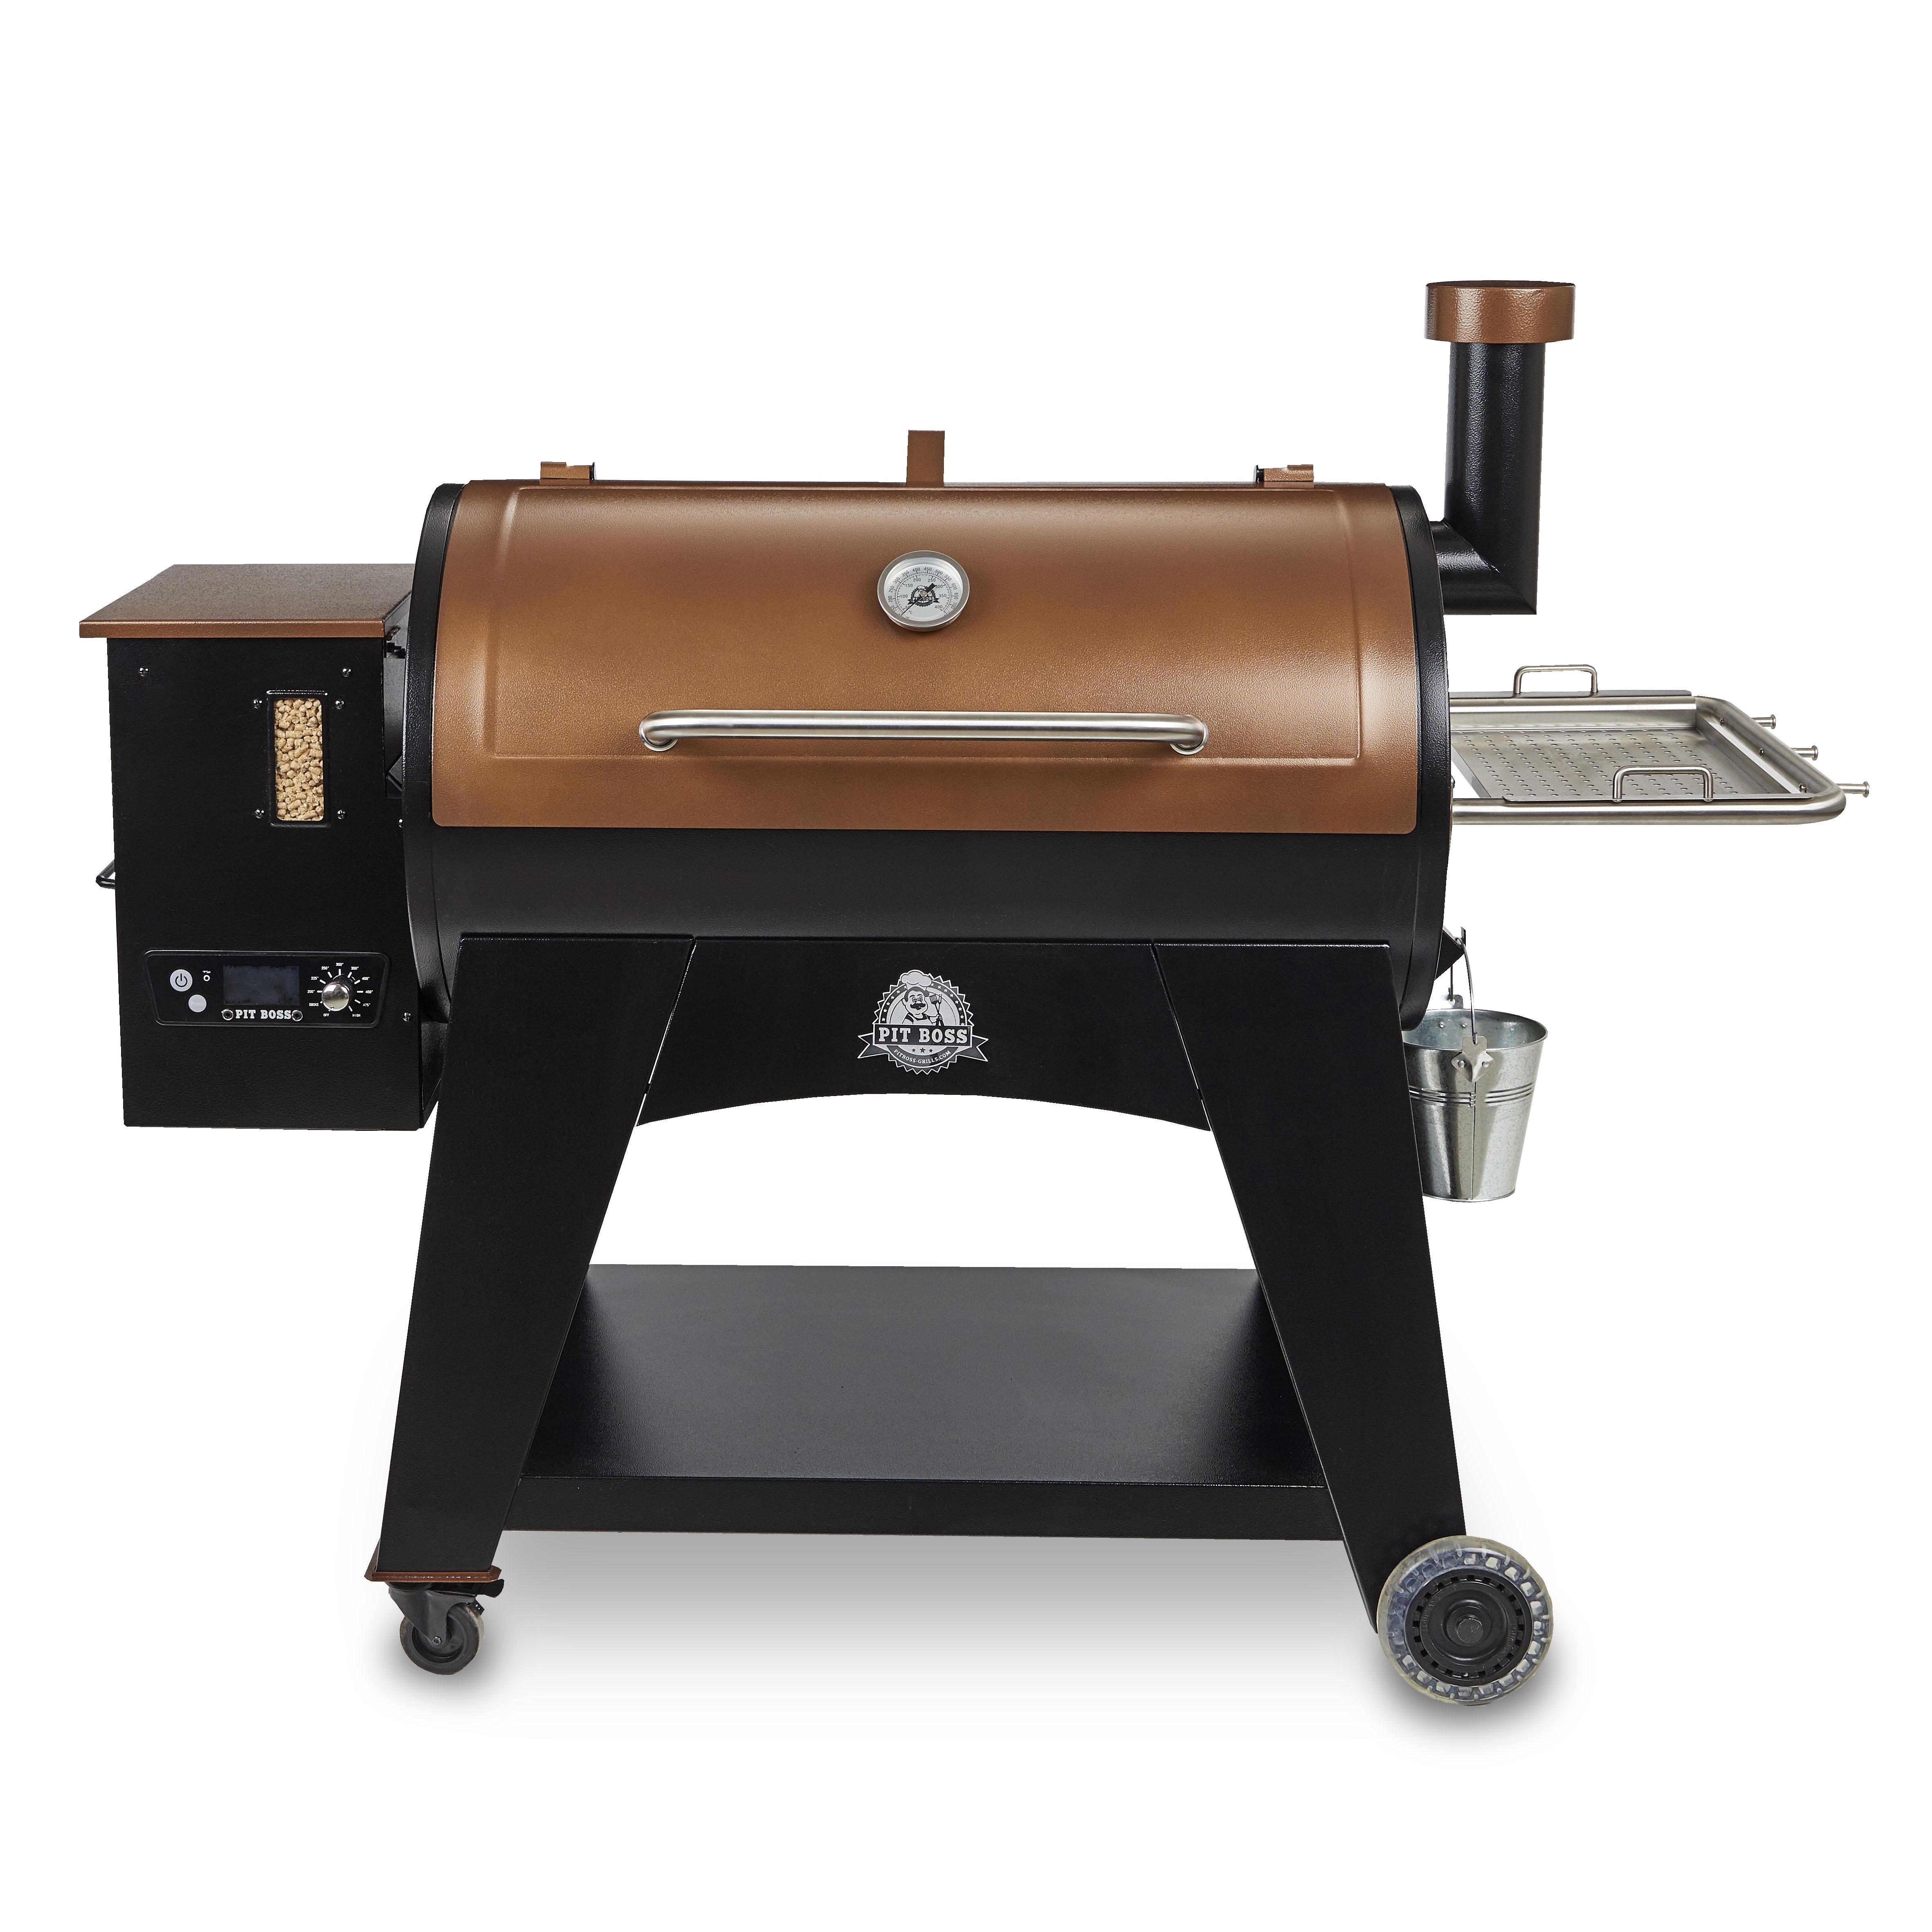 YYMV Pit Boss Austin XL 1000 sq. in. Pellet Grill w/ Flame Broiler $349